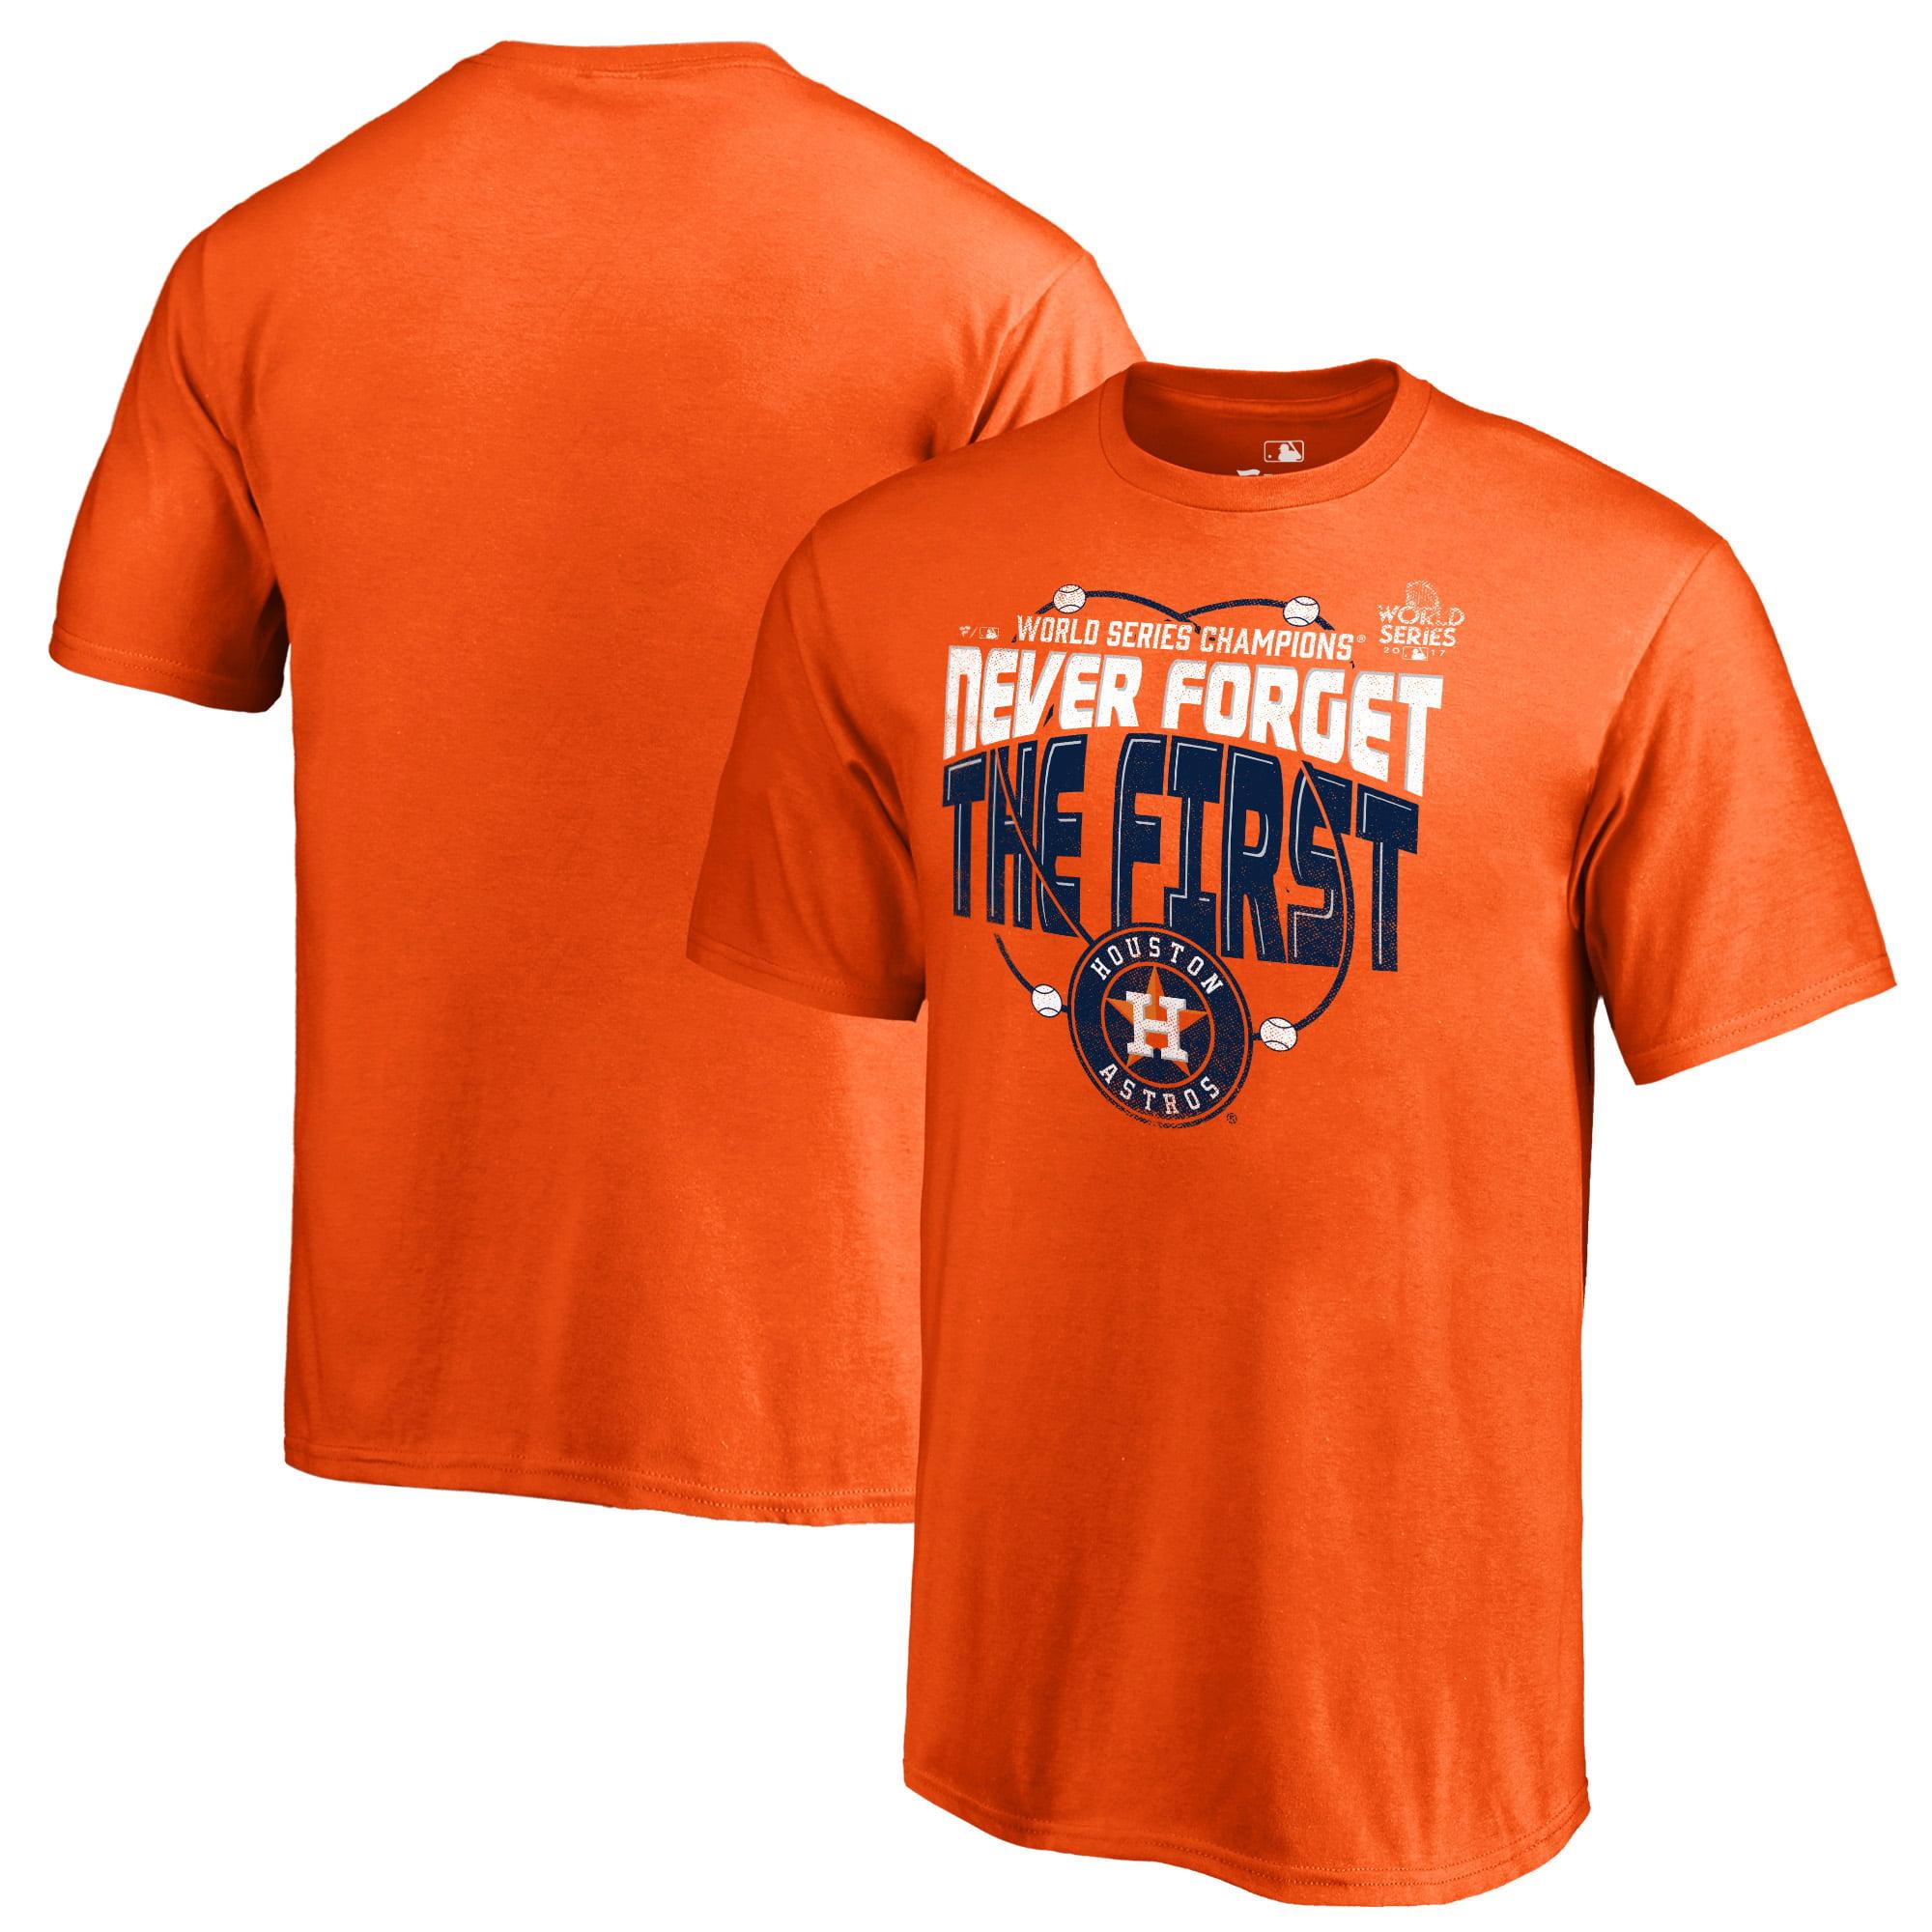 Houston Astros Fanatics Branded Youth 2017 World Series Champions Grandstand T-Shirt - Orange